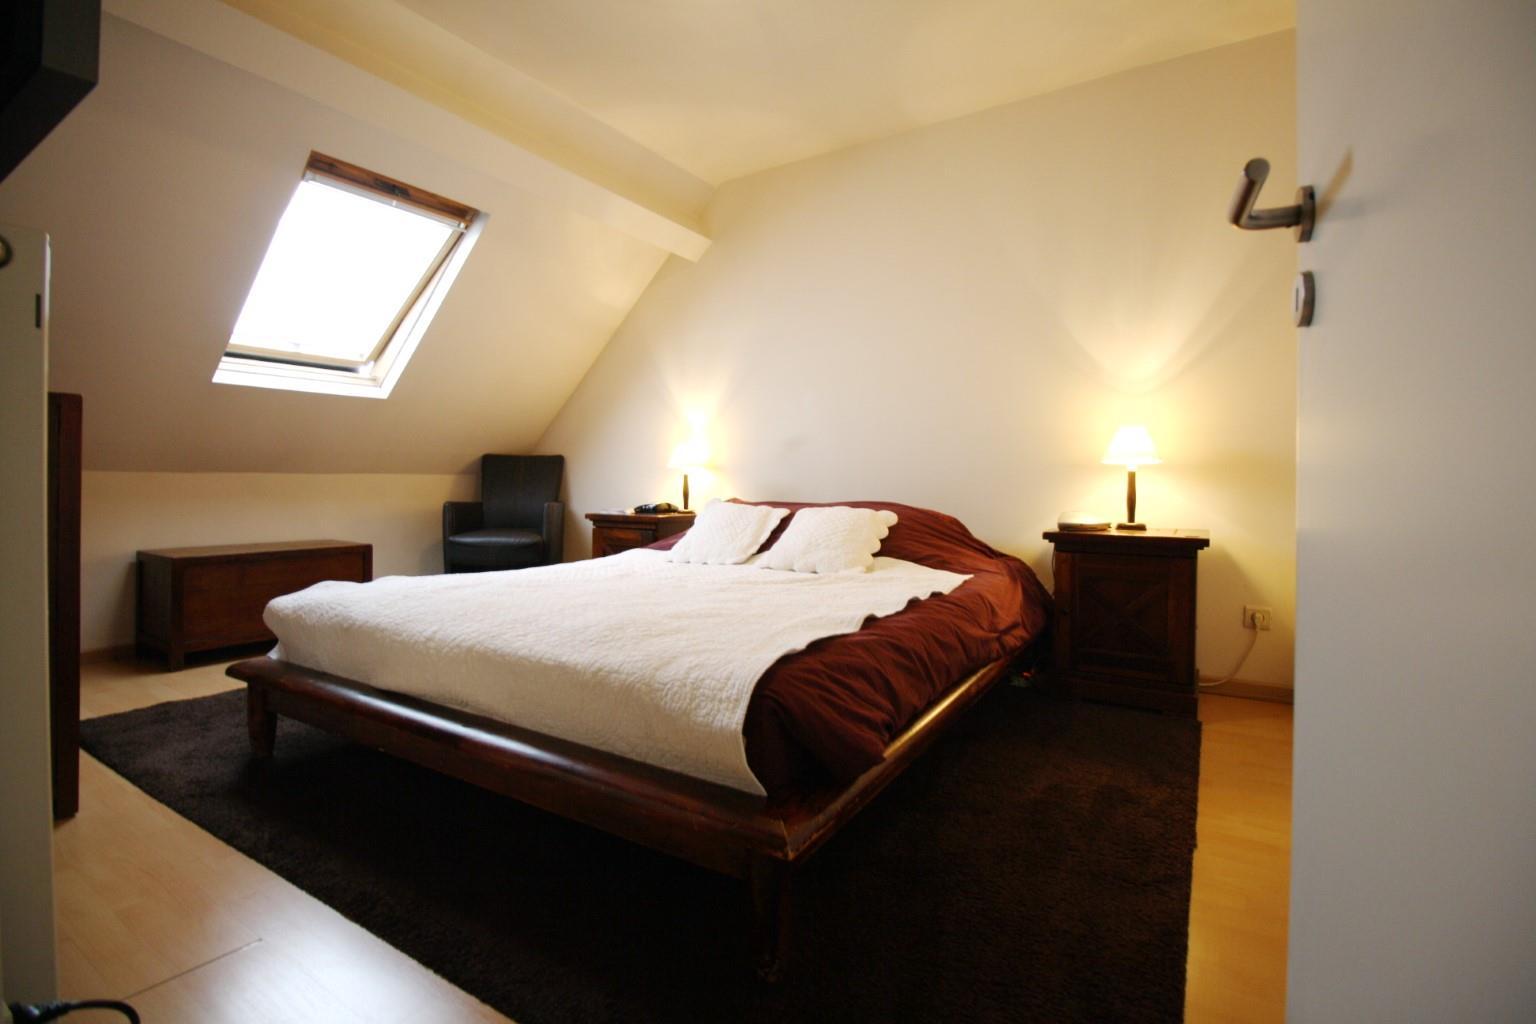 Maison - Laeken - #3014834-24